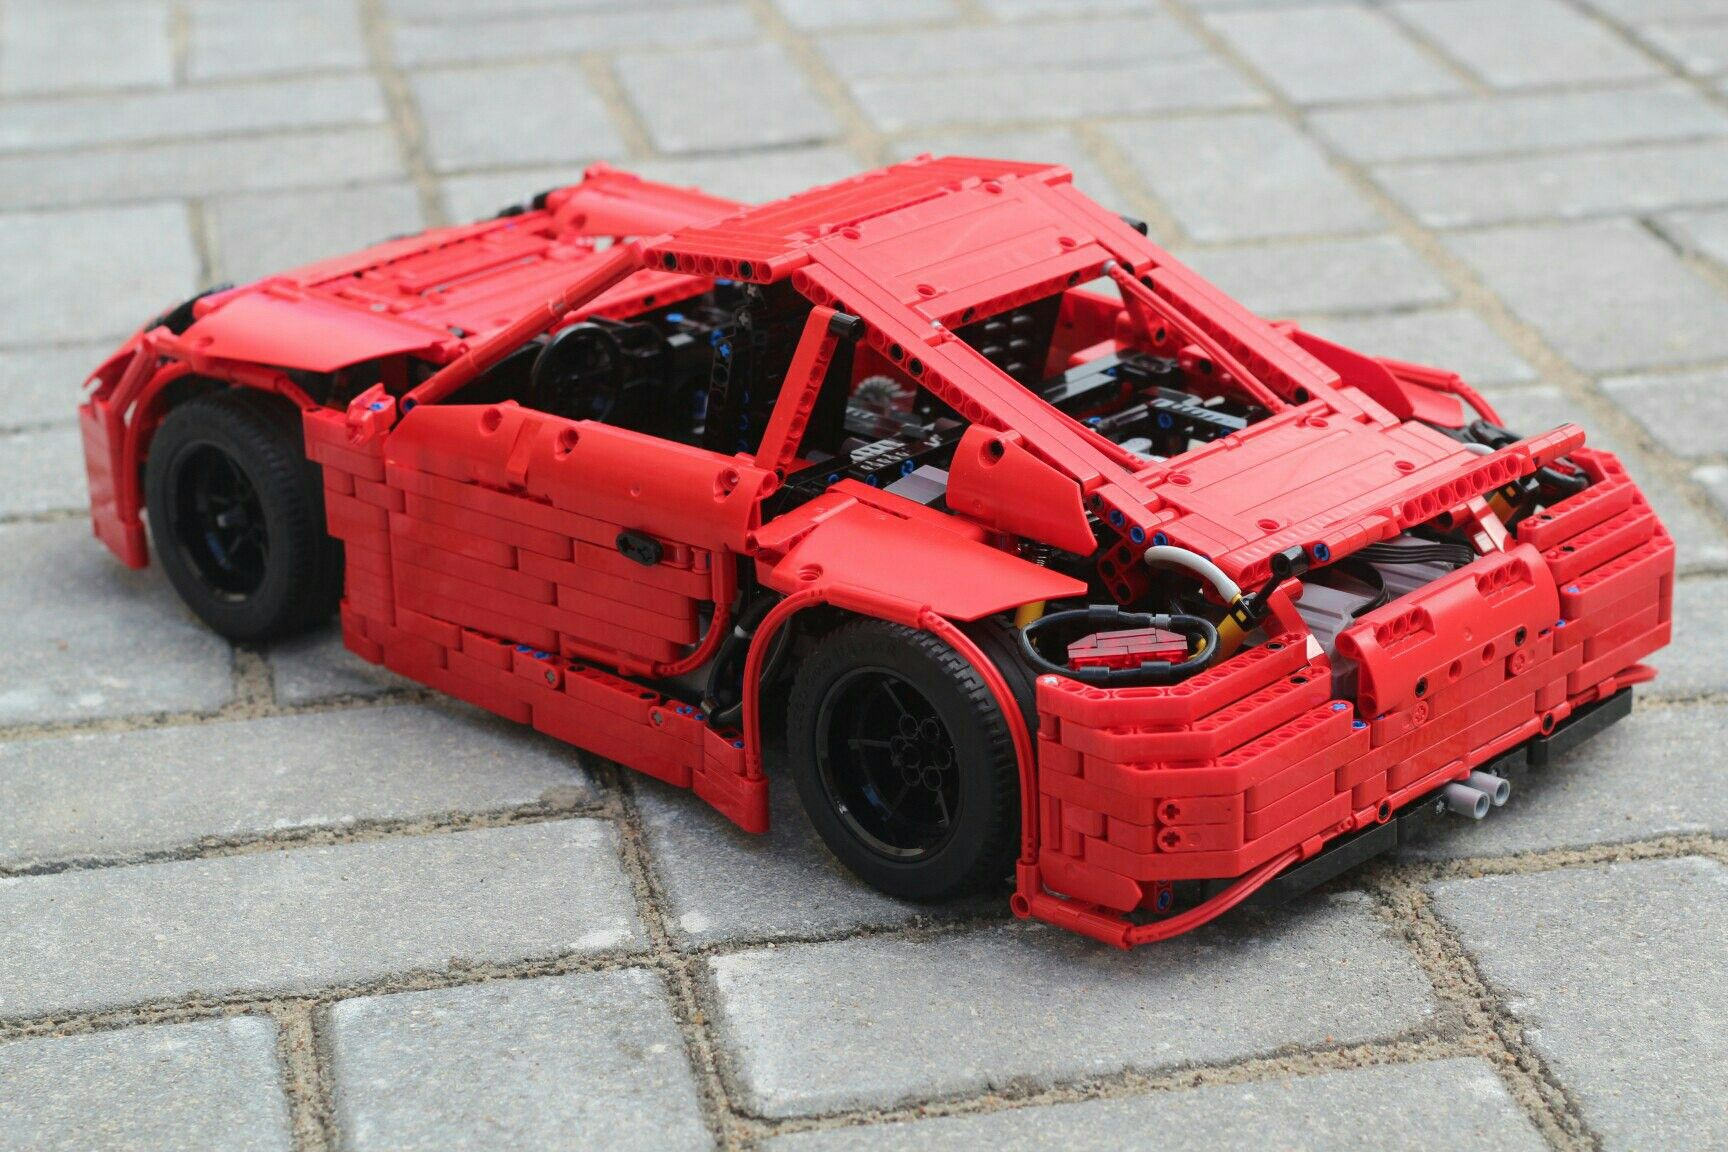 Pin by Sam Bradford on Lego technic Lego technic, Lego